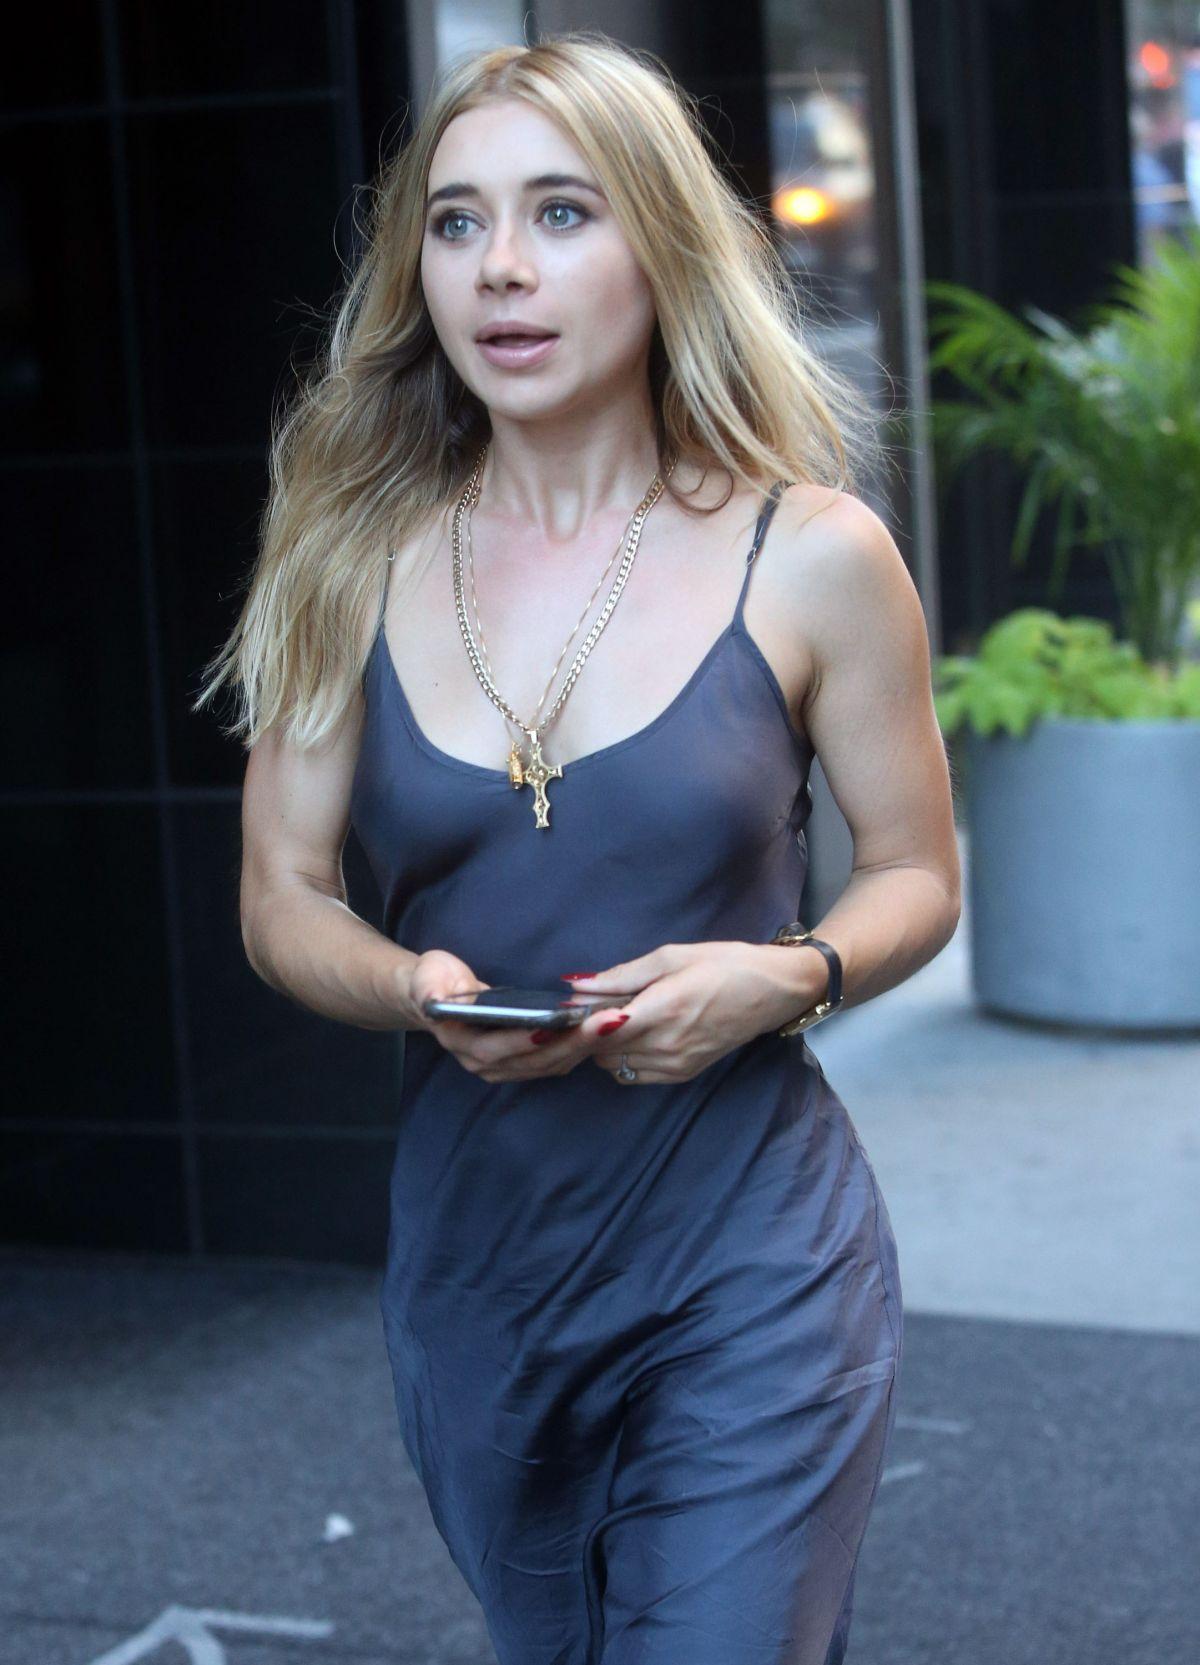 Celebrity Olesya Rulin naked (21 photo), Tits, Hot, Boobs, braless 2017